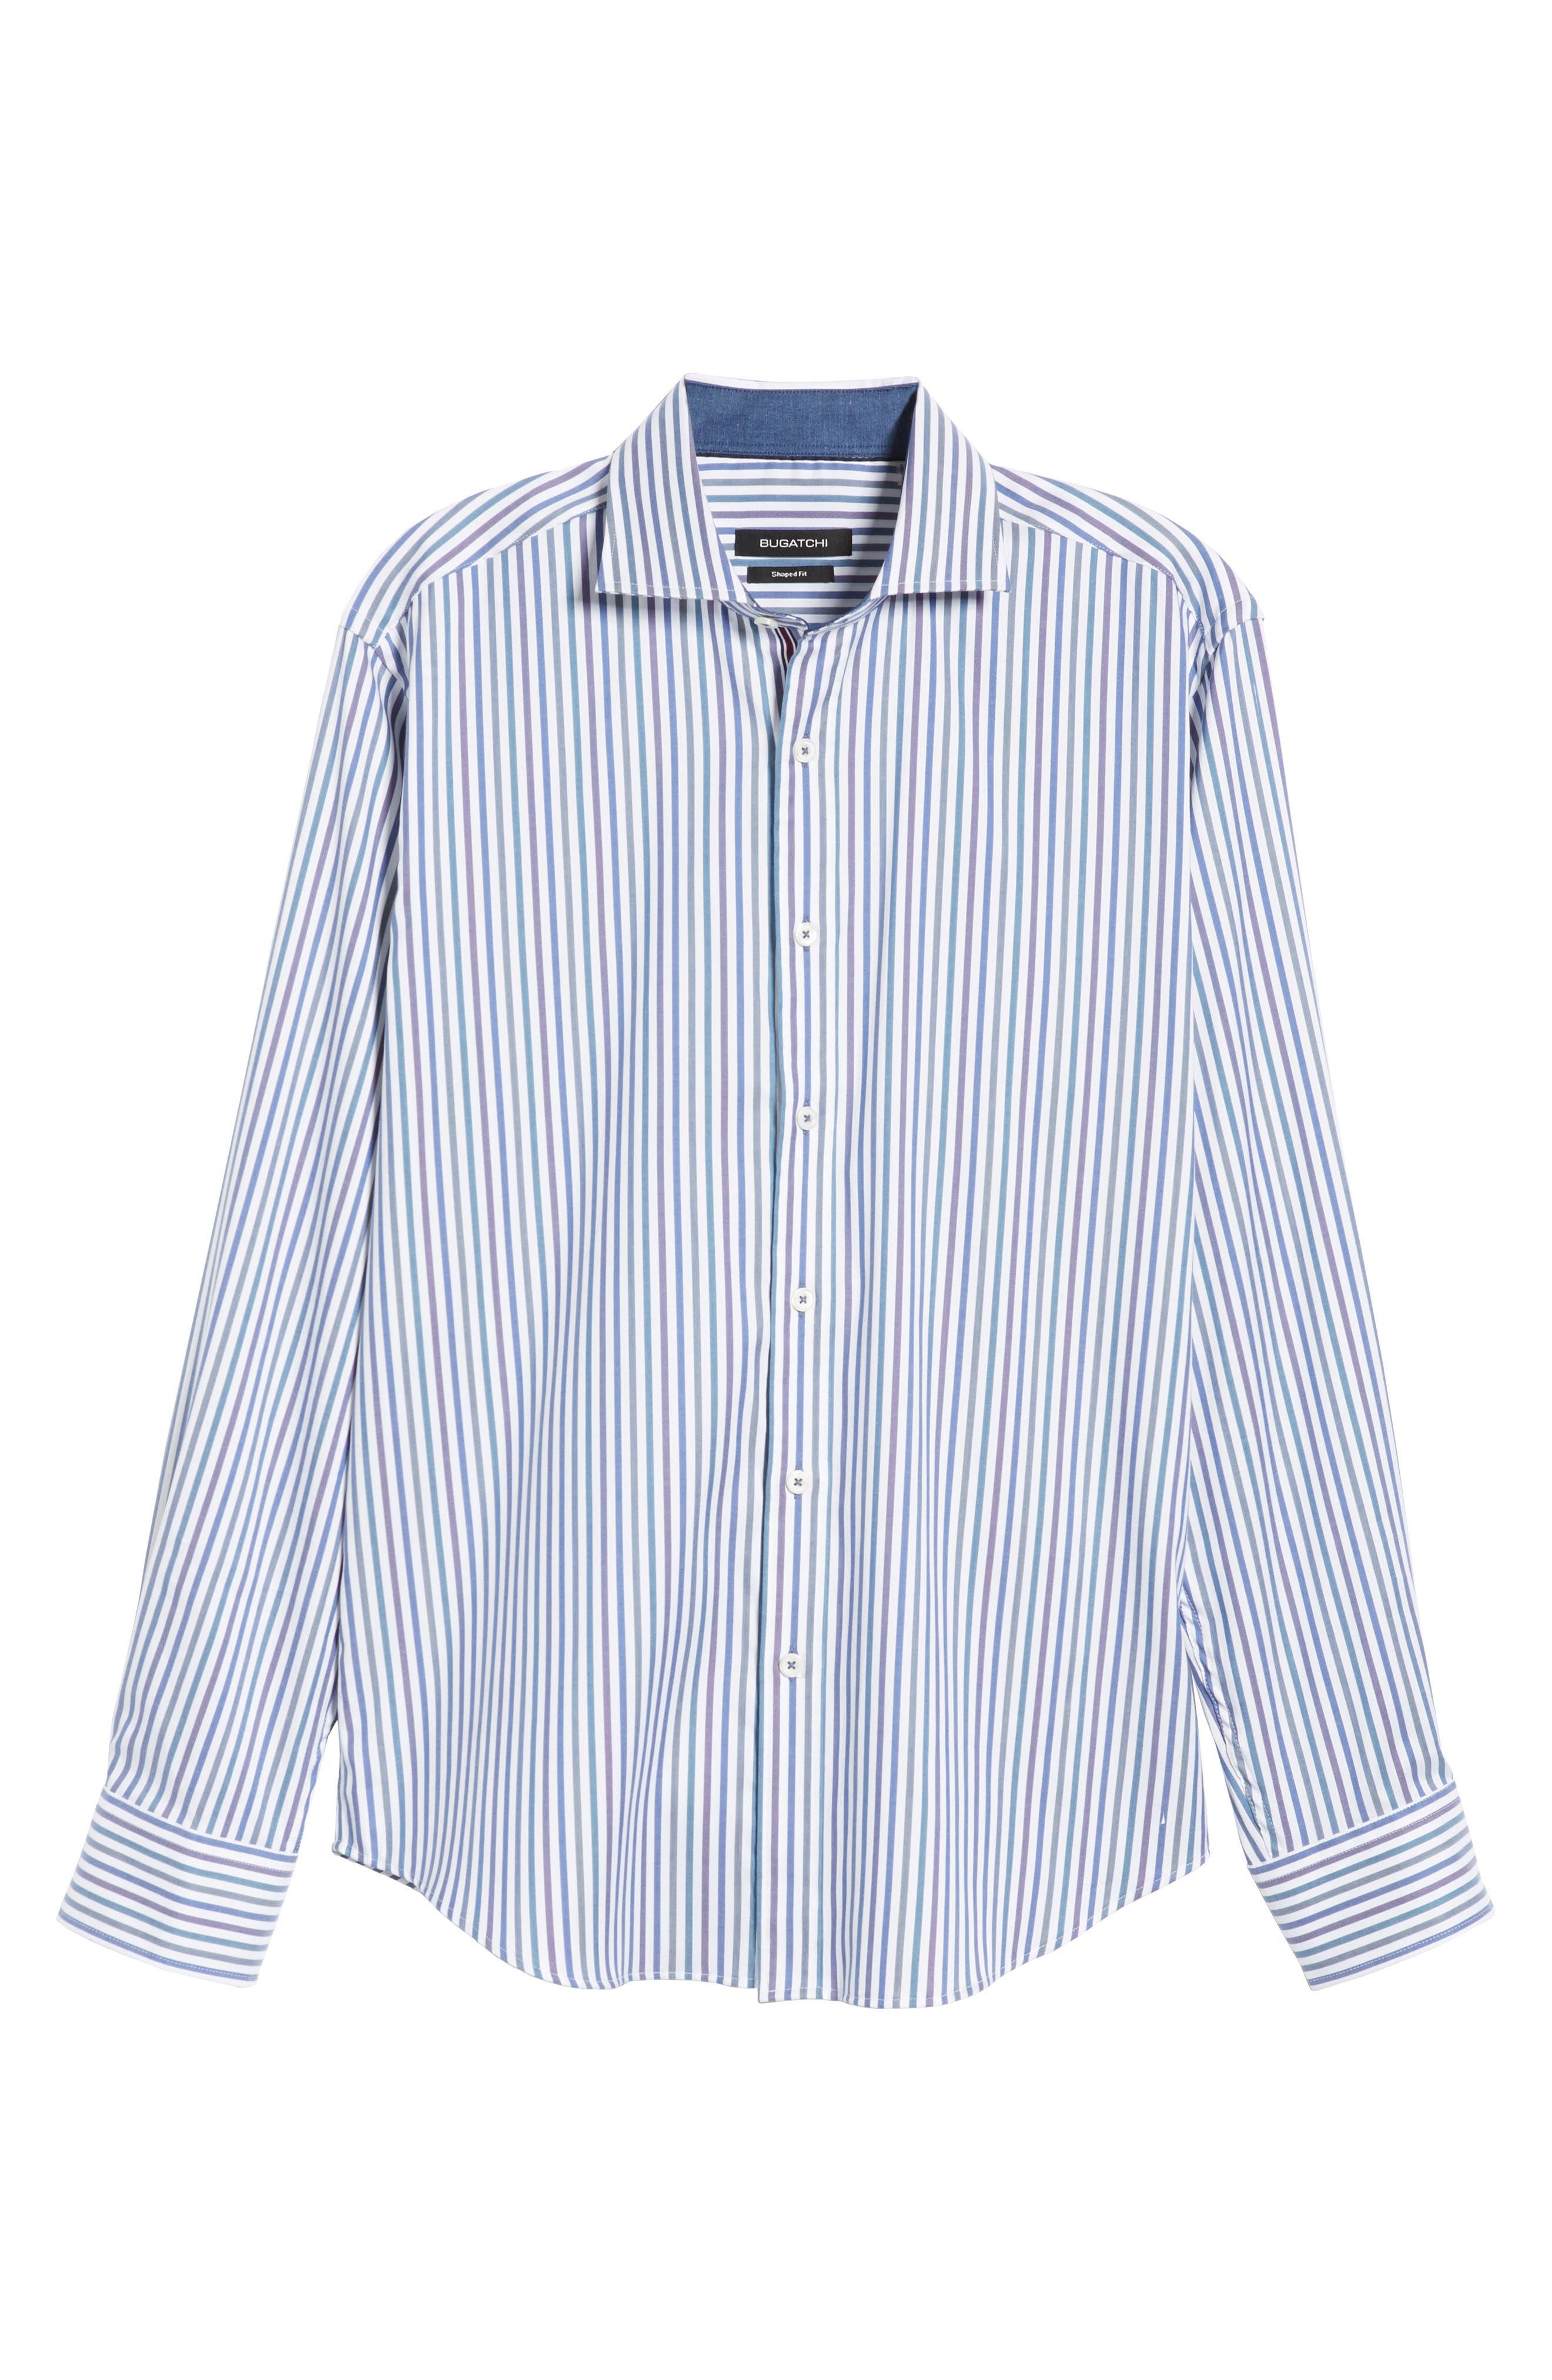 BUGATCHI, Classic Fit Stripe Sport Shirt, Alternate thumbnail 5, color, CHALK